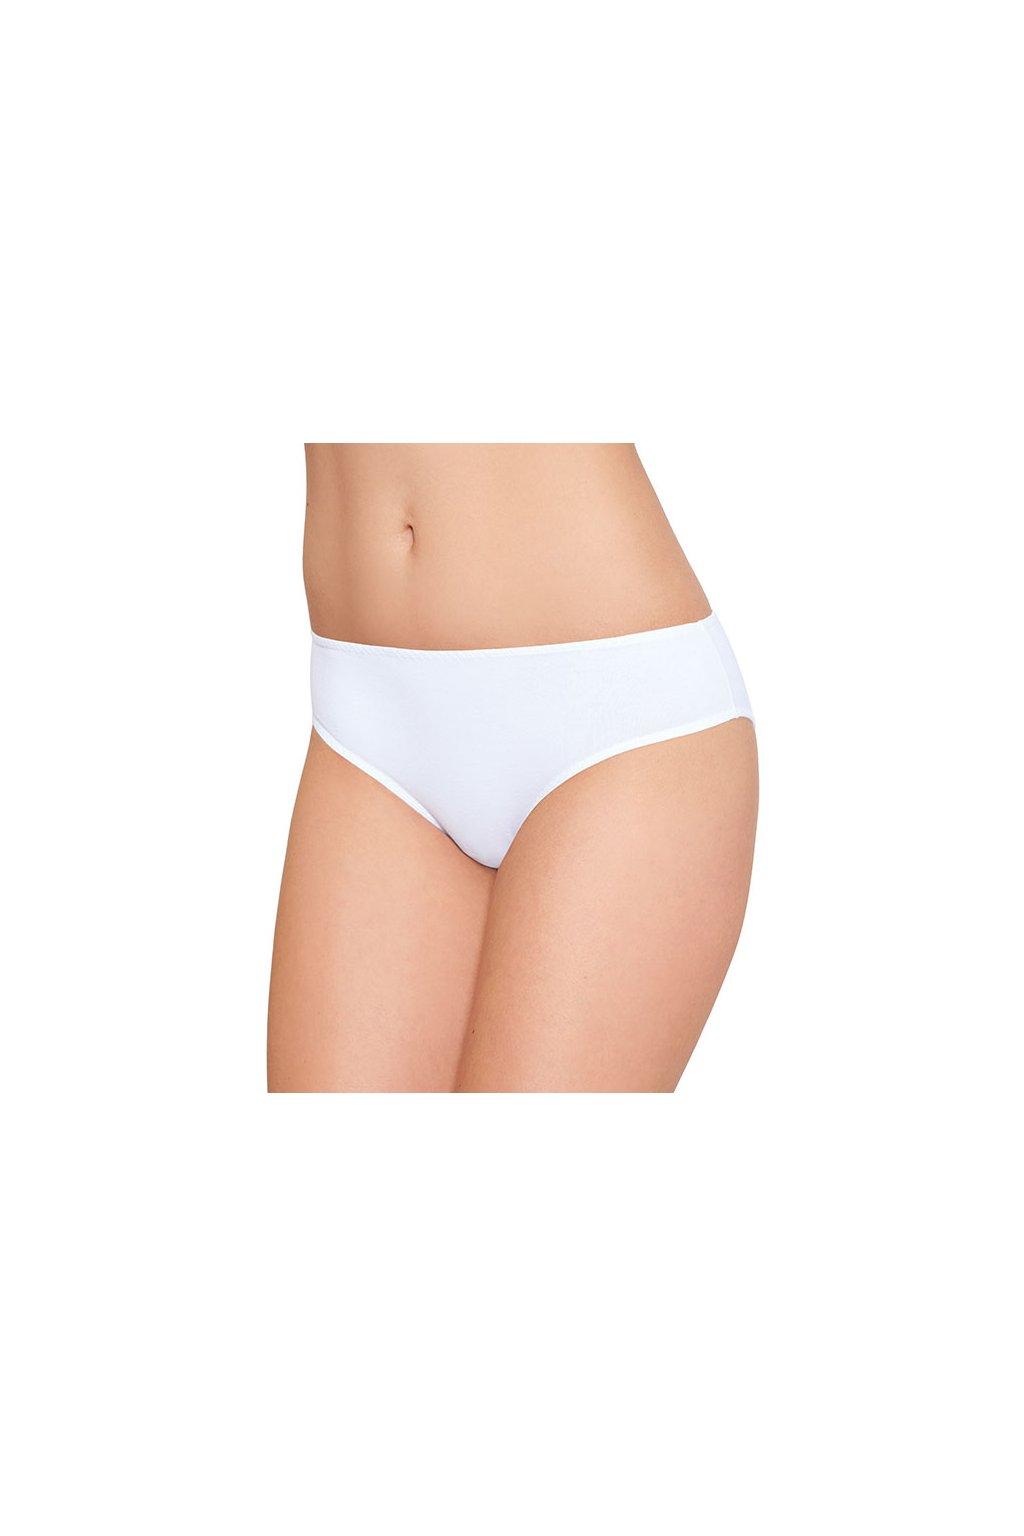 Dámské kalhotky, 10090 1, bílá